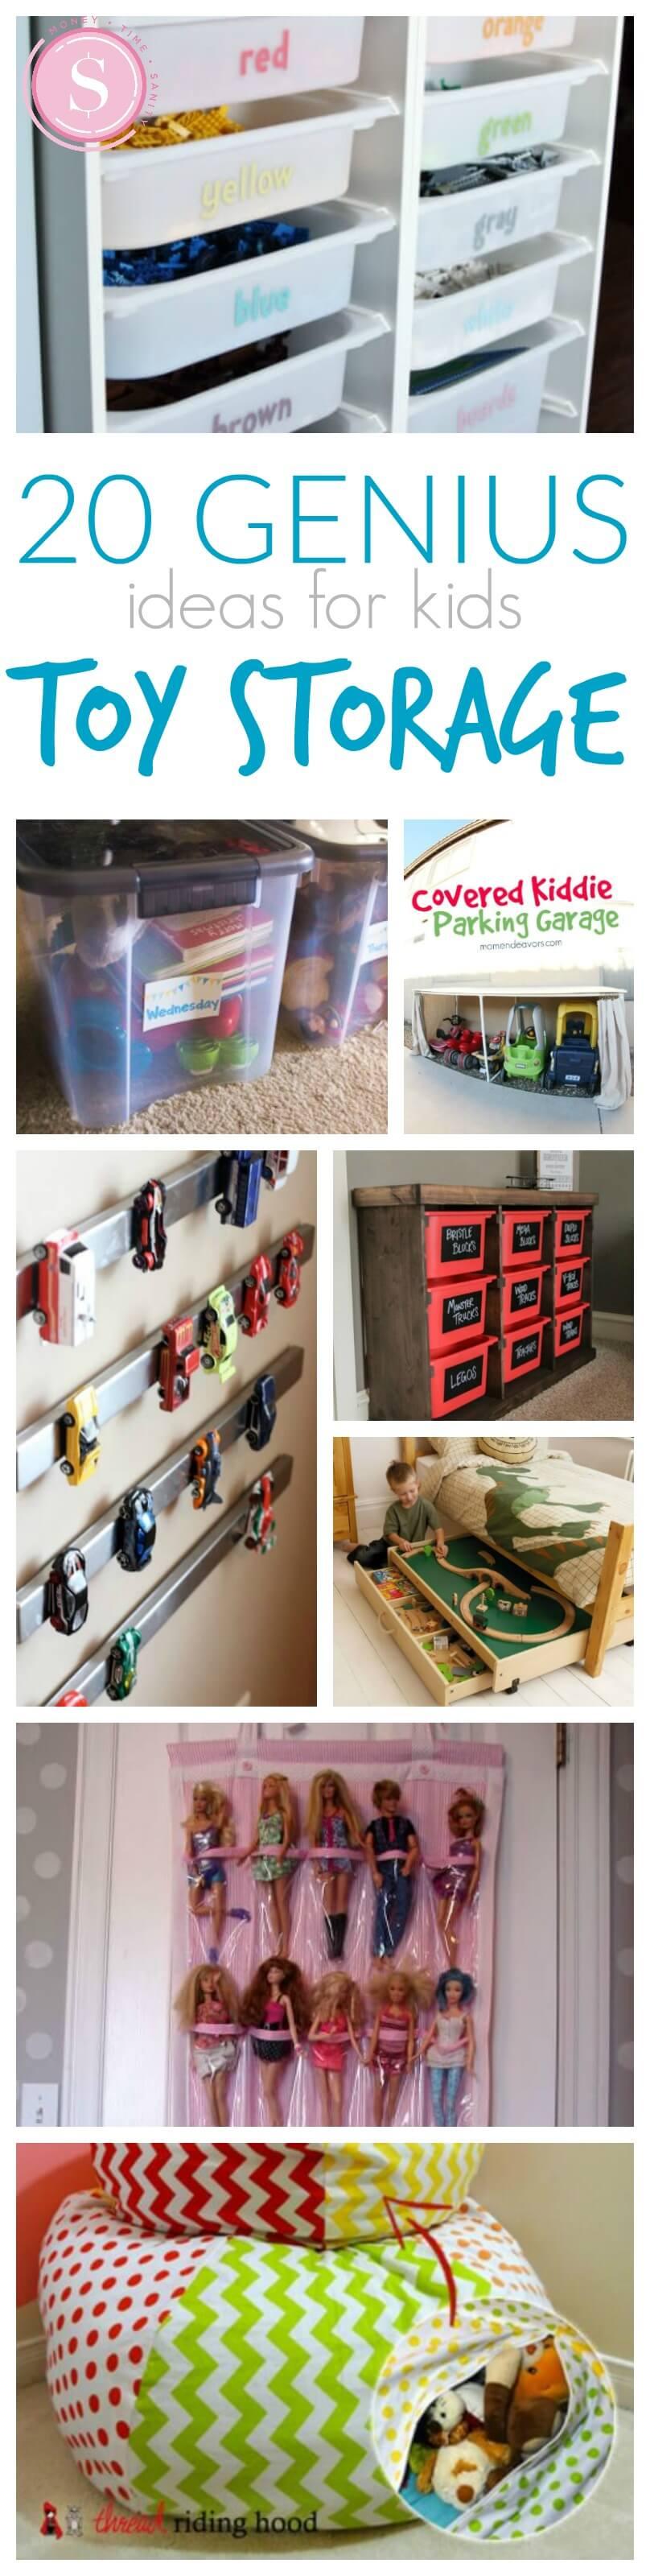 20 genius toy storage ideas for kids rooms 20 Storage Ideas